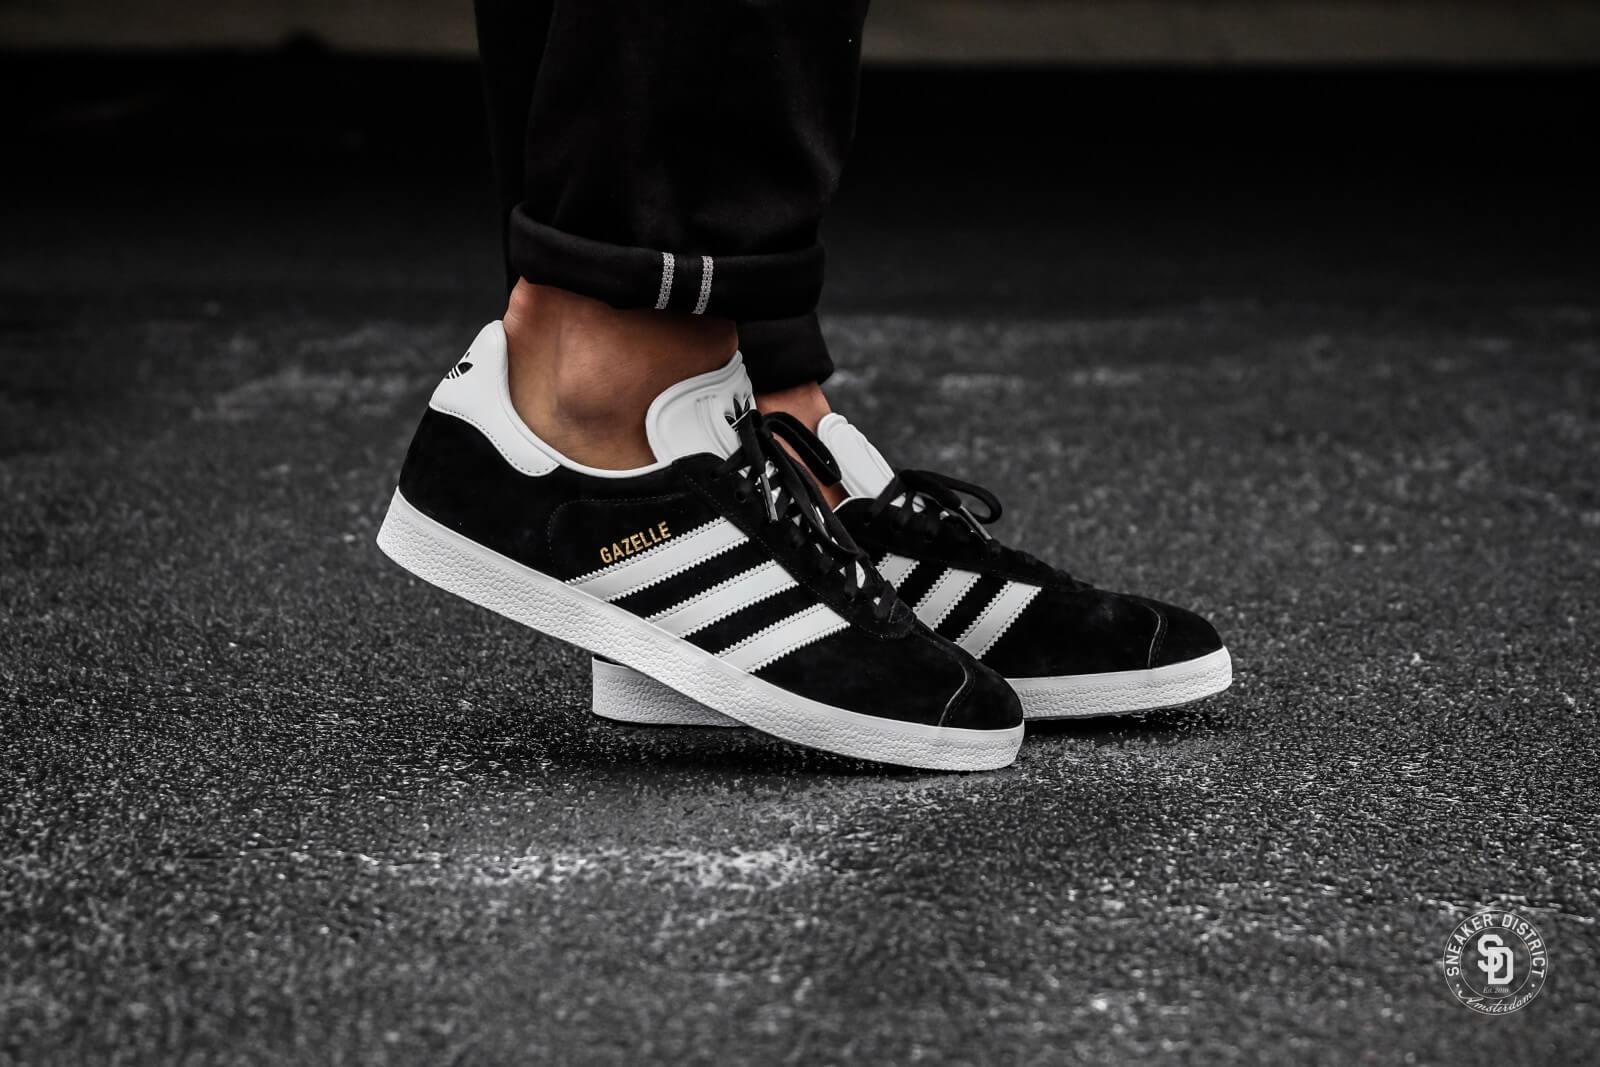 Adidas Gazelle Core Black White-Gold - BB5476 84da850a9f